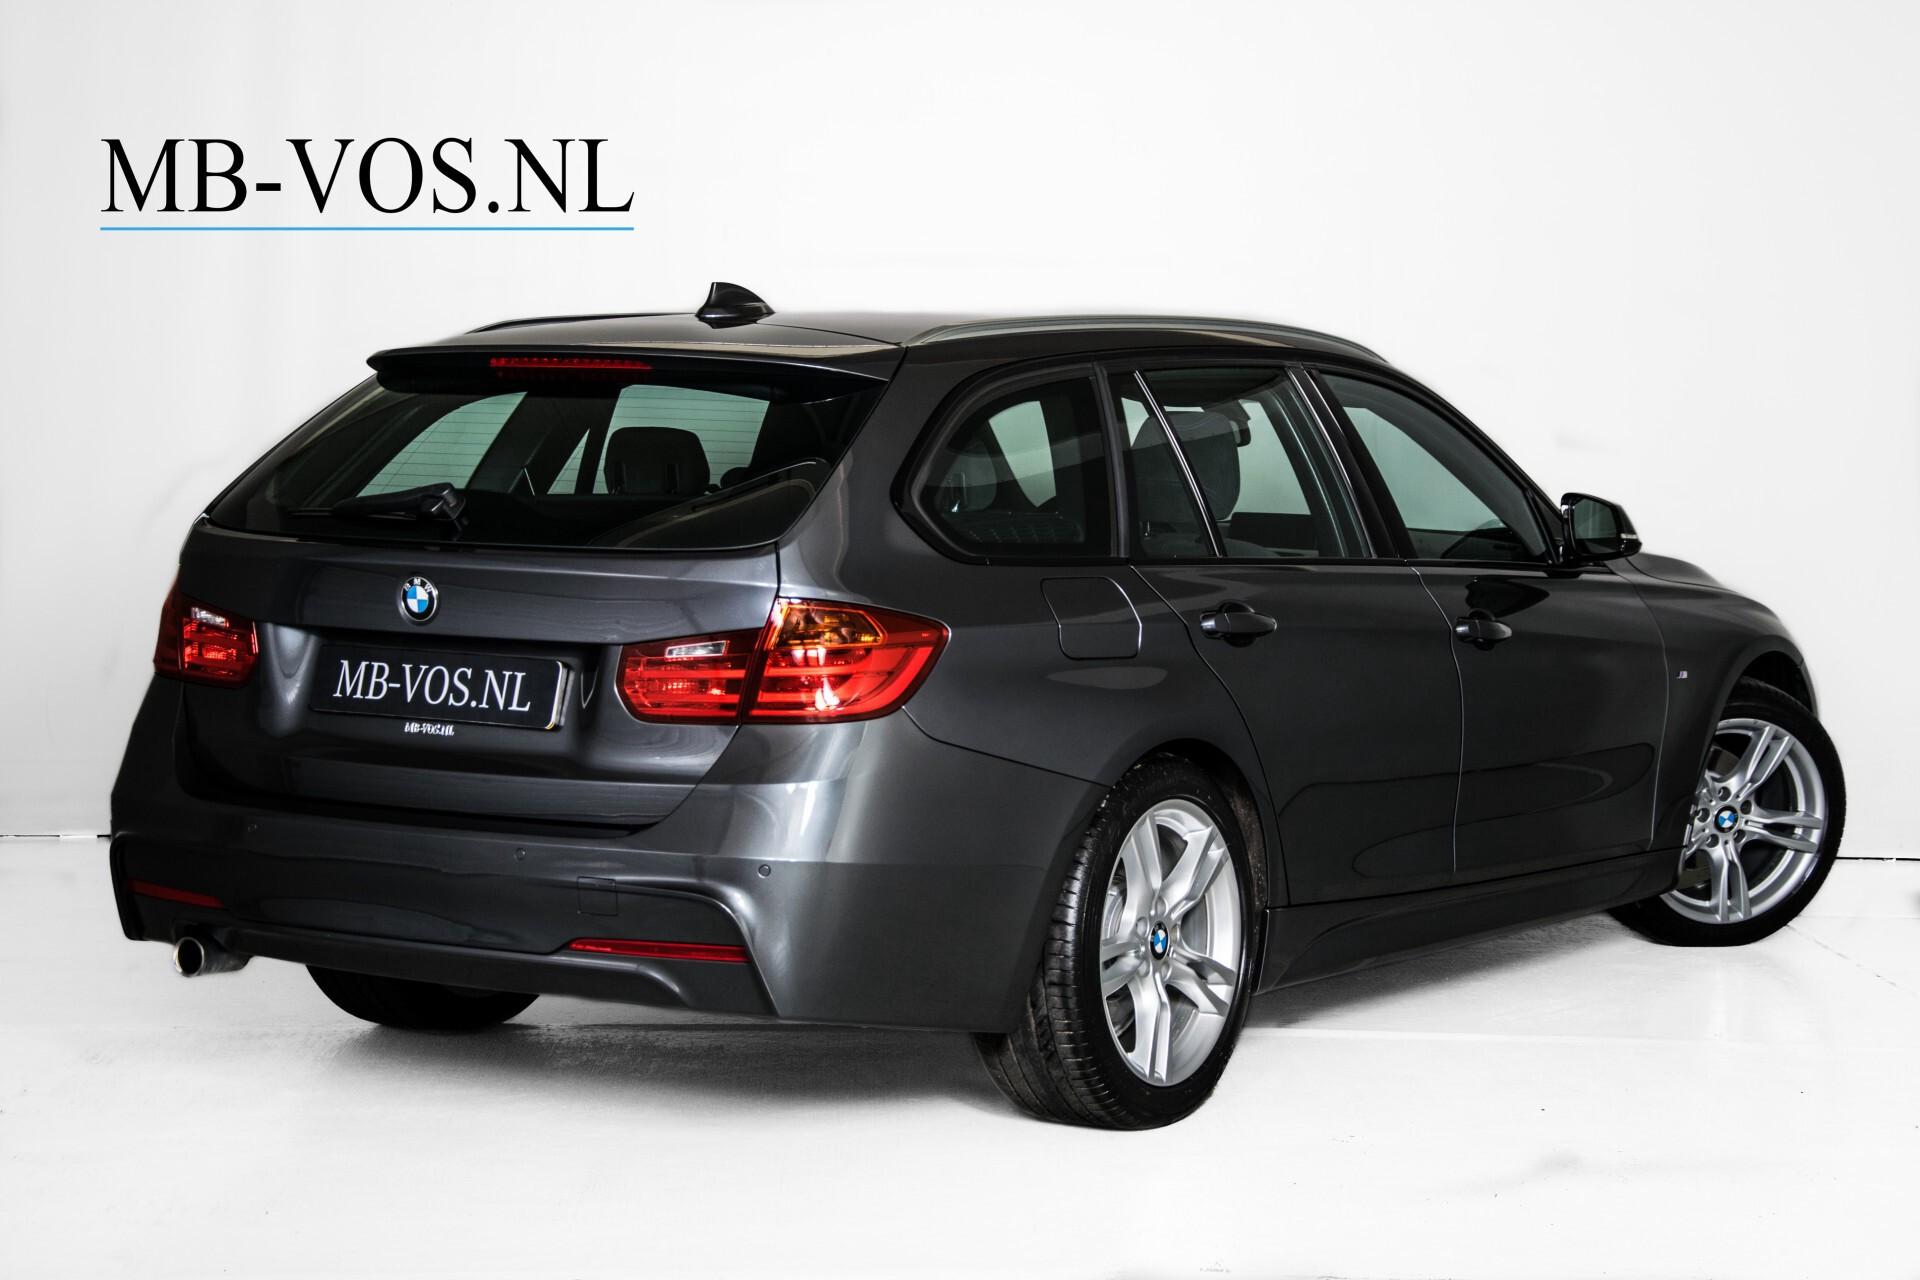 BMW 3 Serie Touring 316i M-Sportpakket Executive NL Auto/NAP Aut8 Foto 2